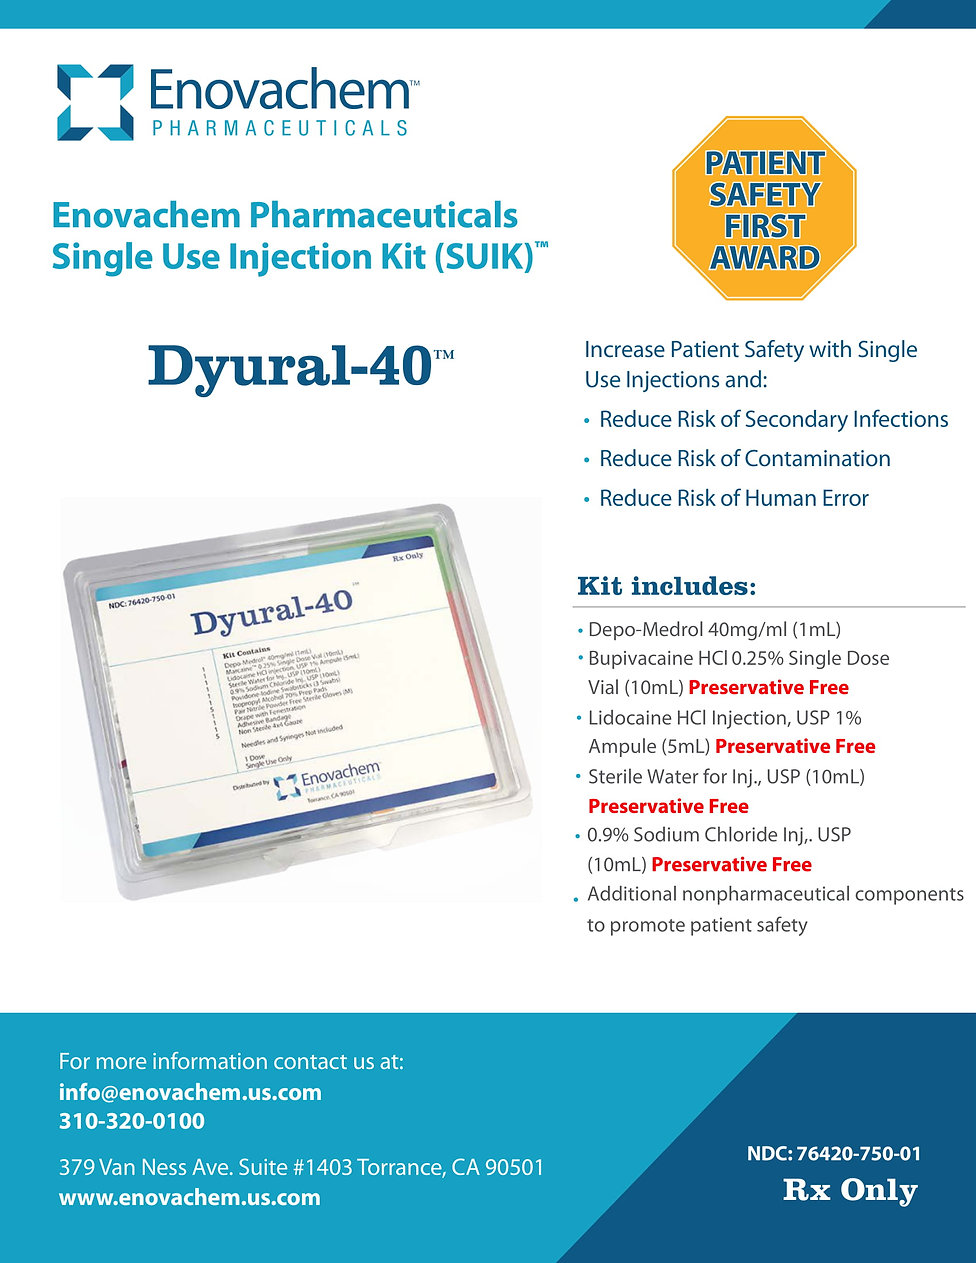 Dyural-40